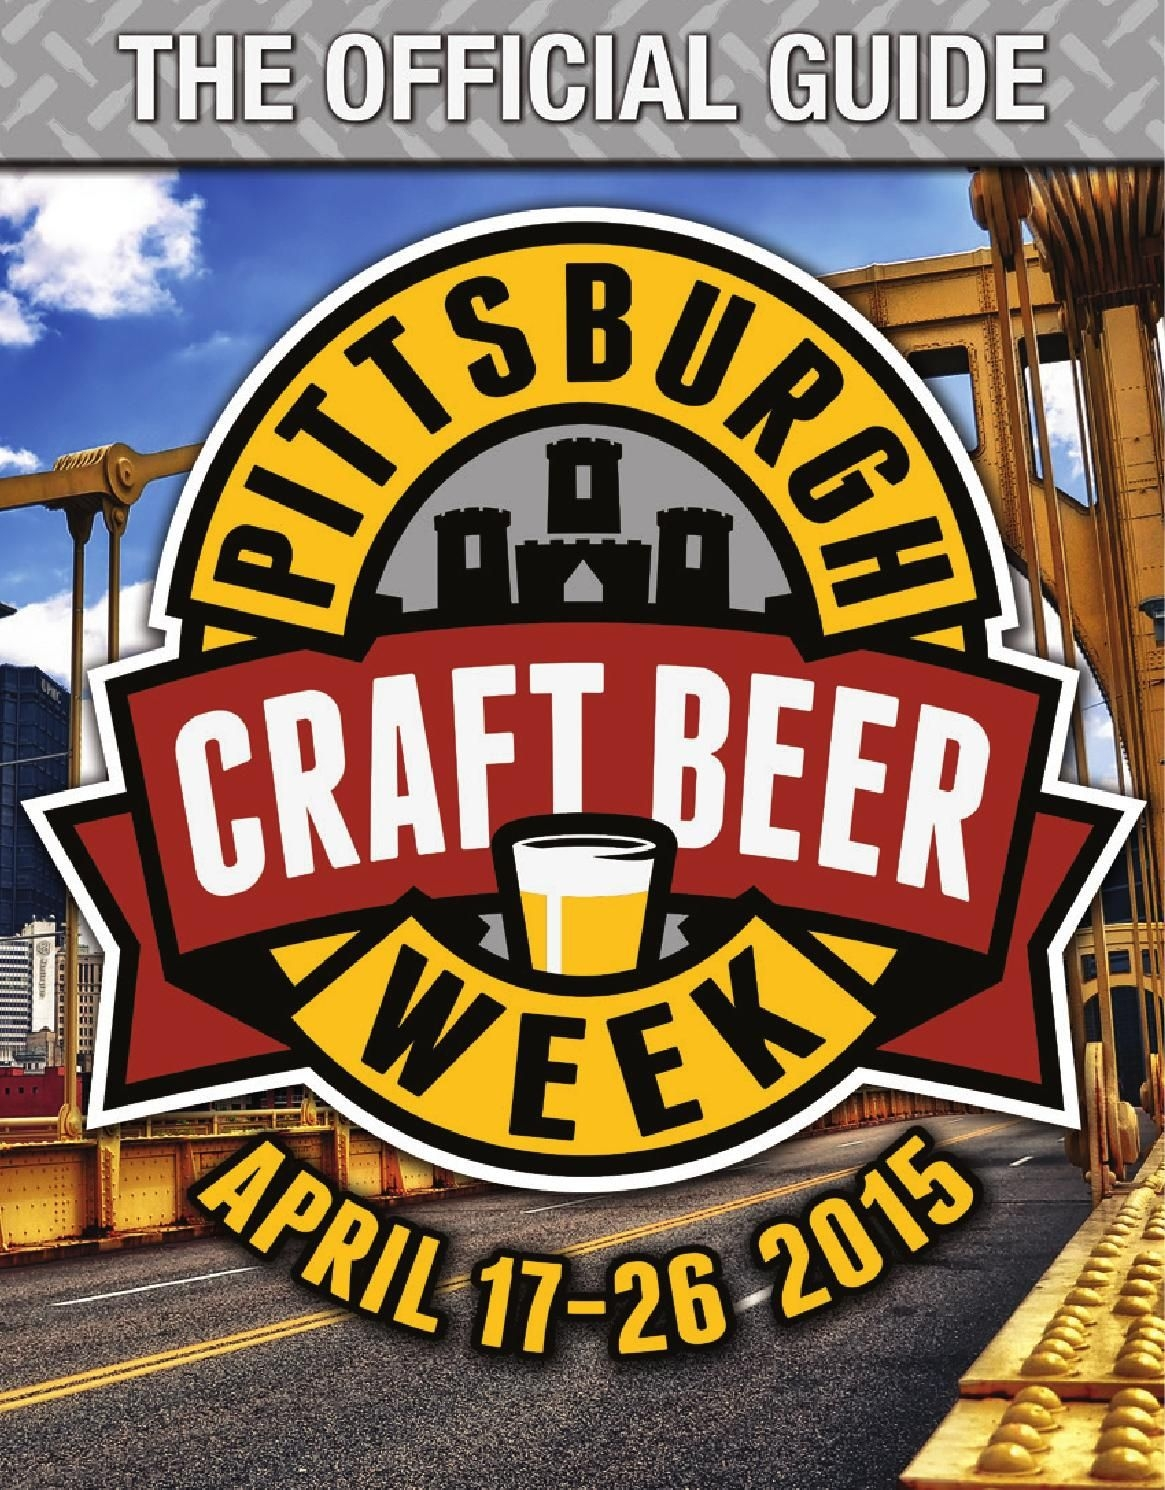 Pittsburgh Craft Beer Week 2015 Guide By Craftpittsburgh - Issuu